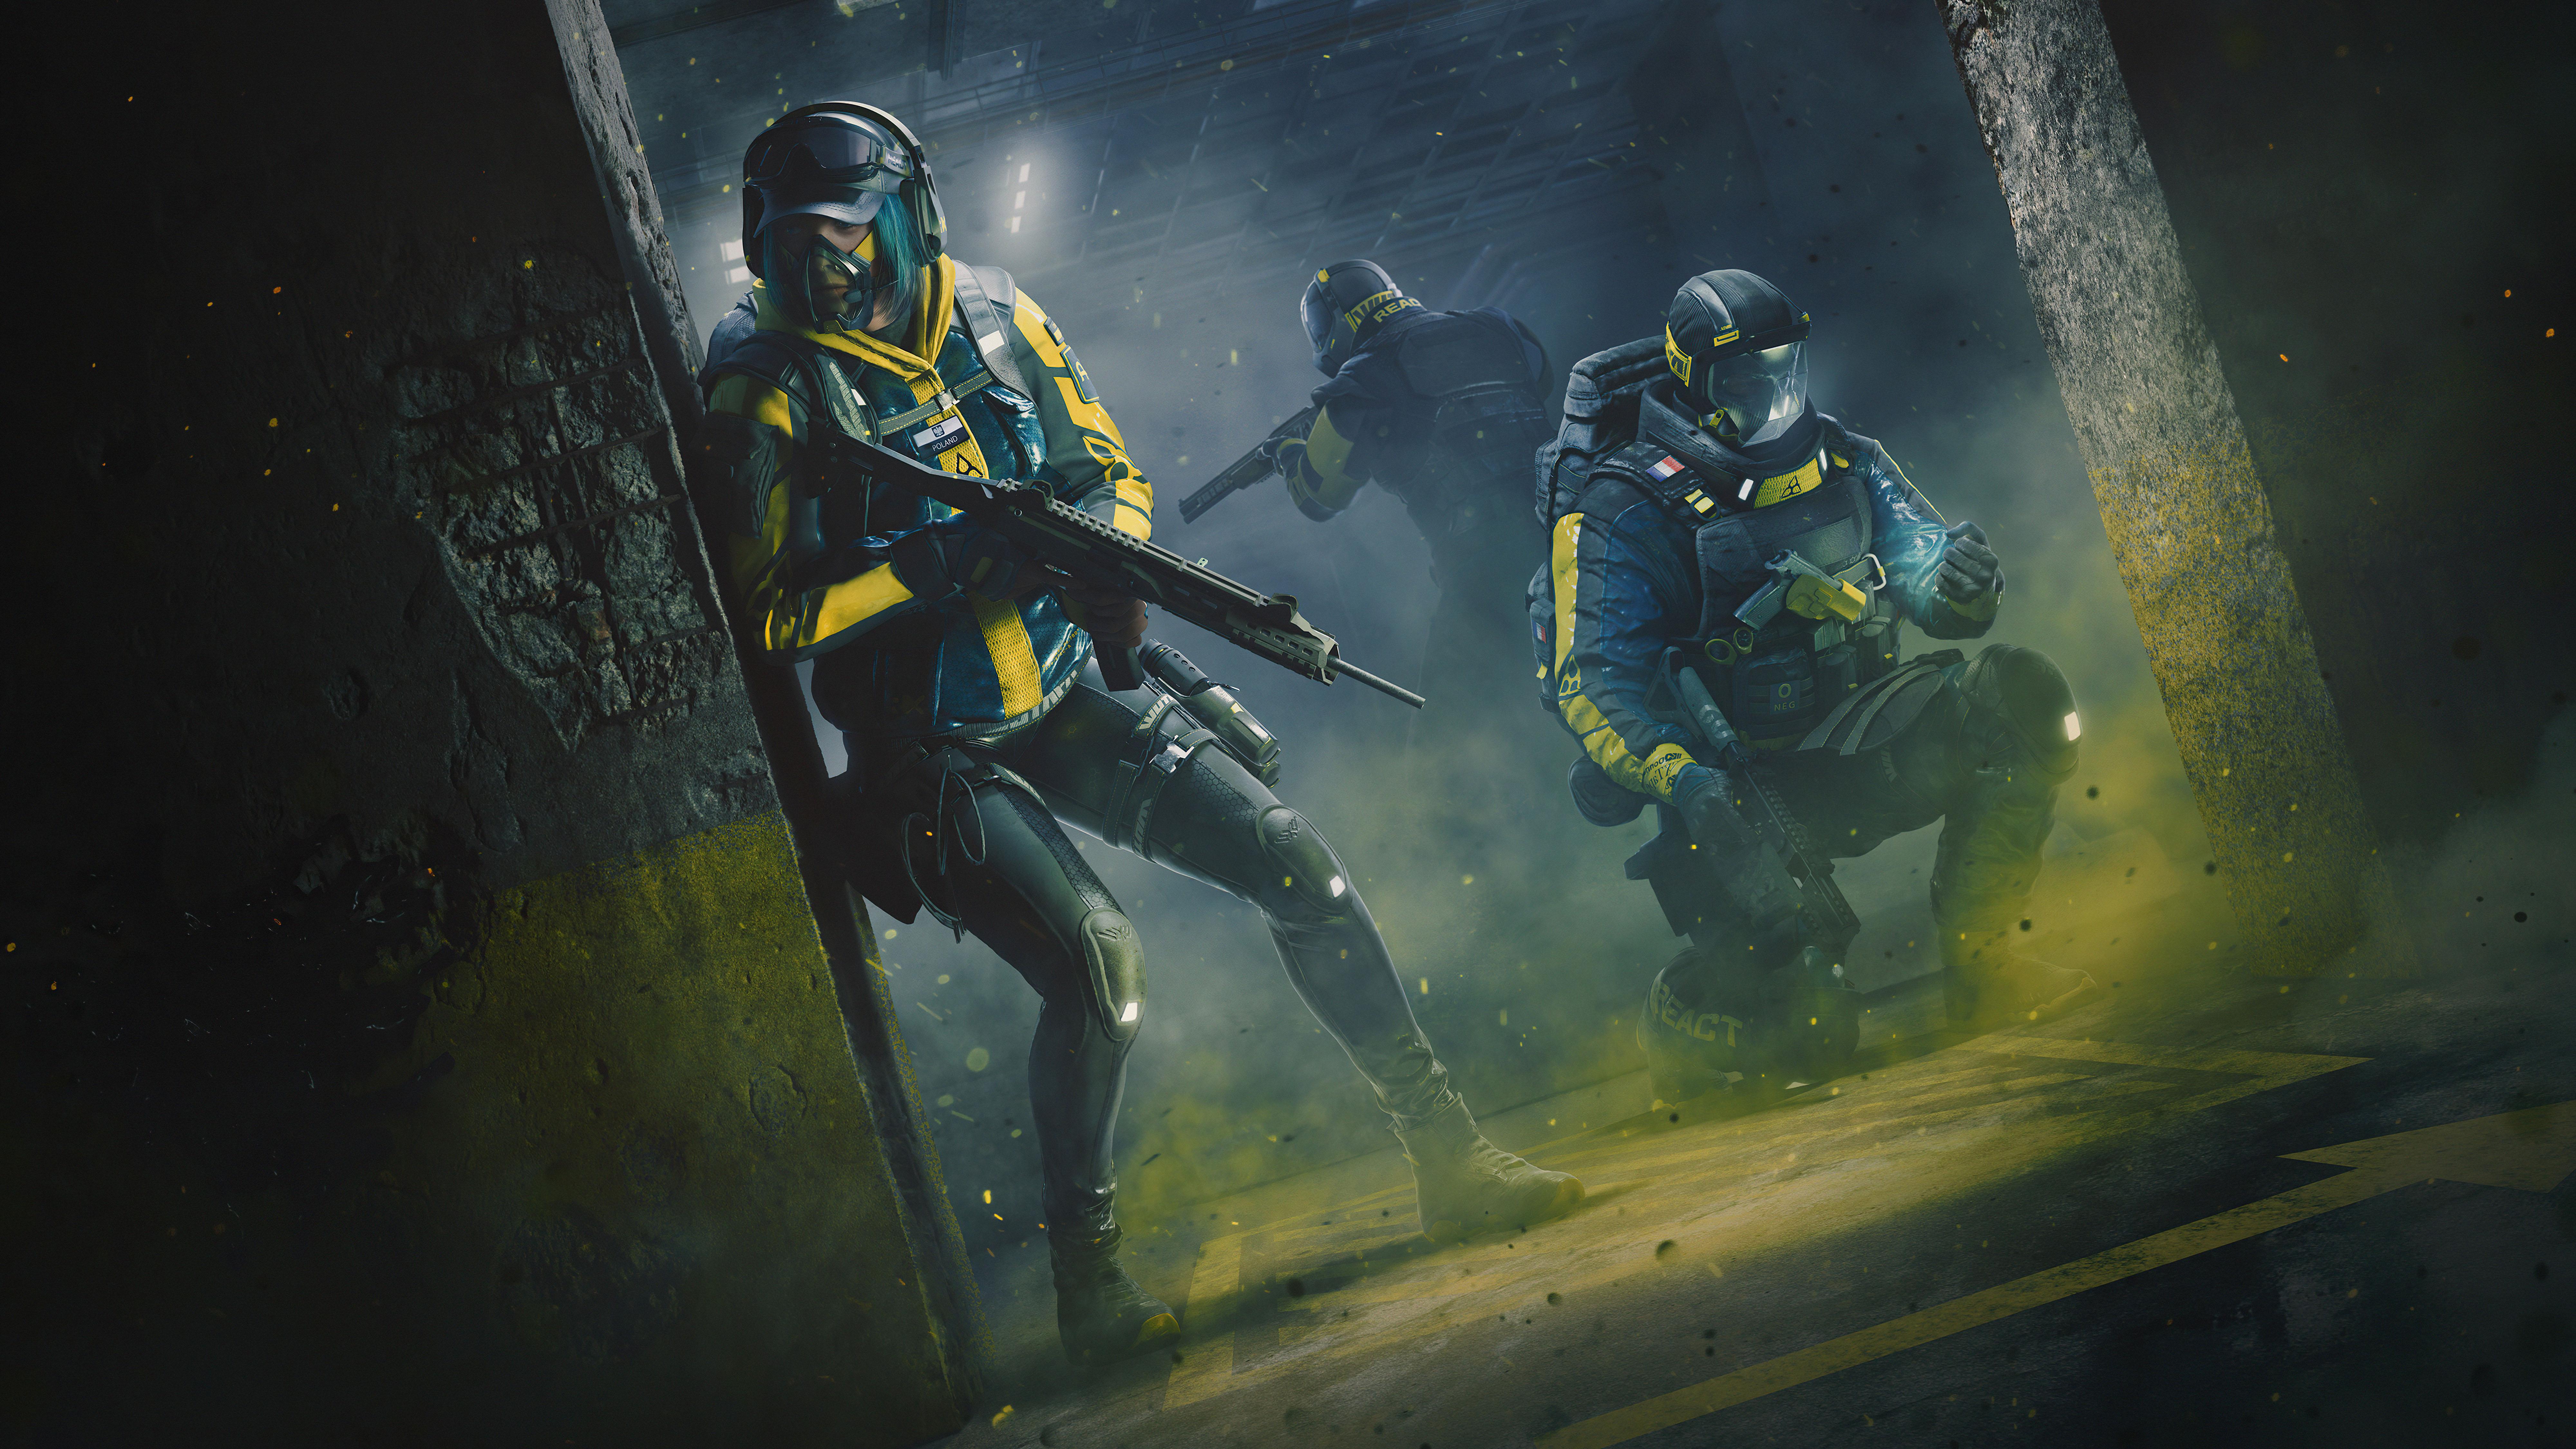 Fondos de pantalla Tom Clancy's Rainbow Six Extraction 2021